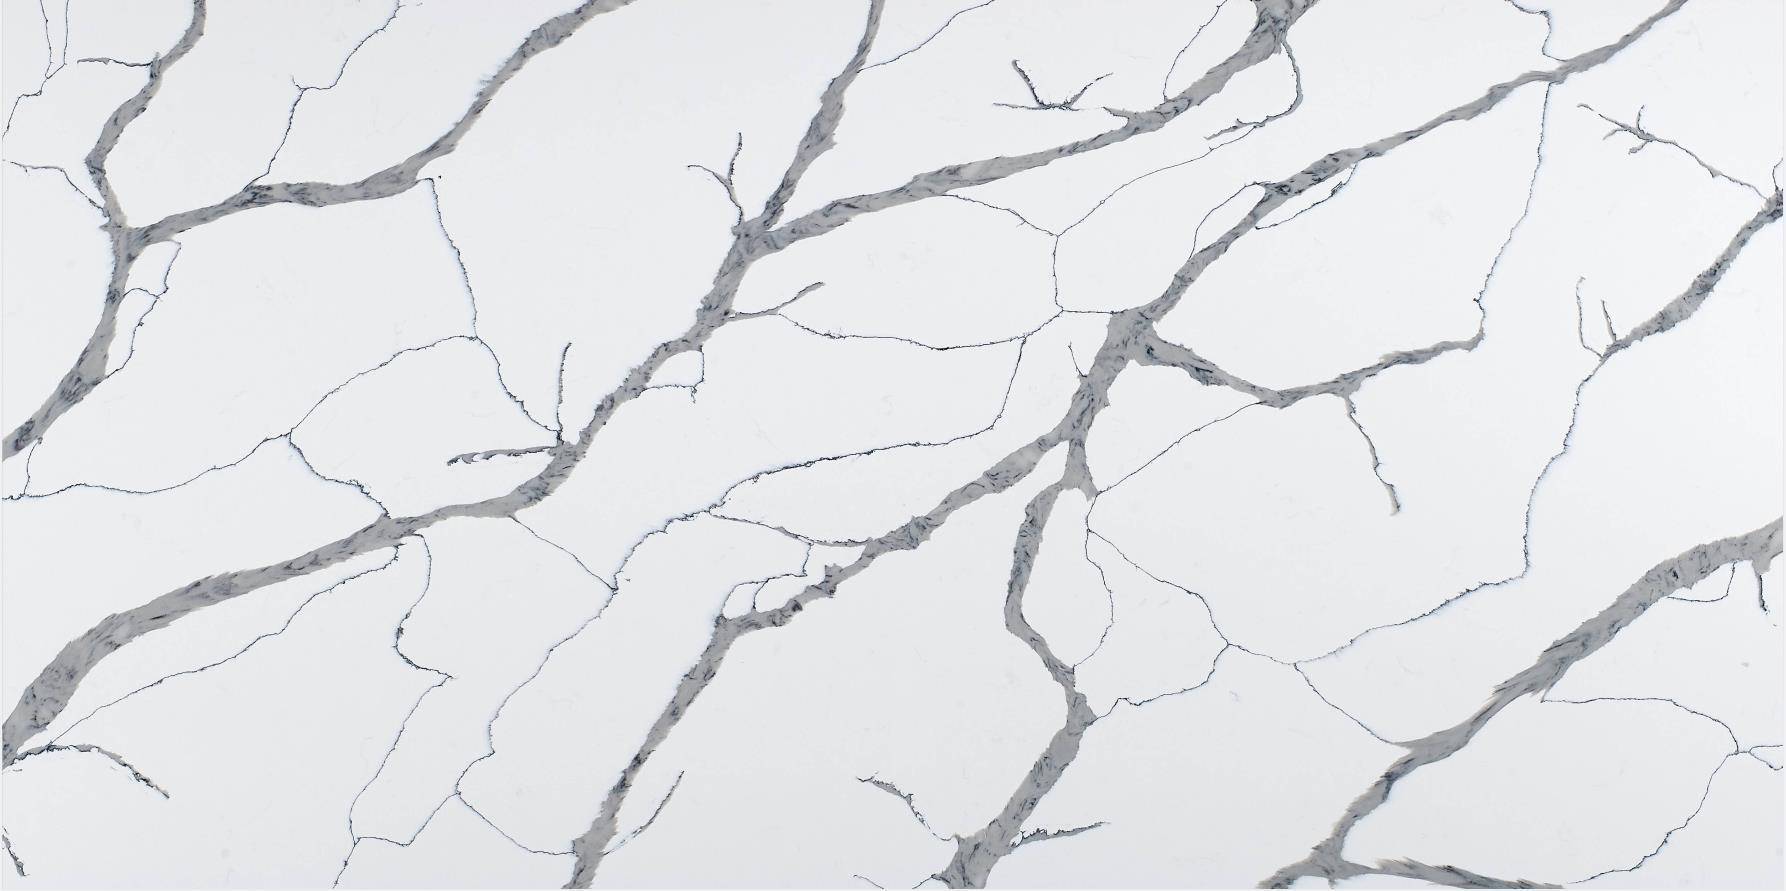 K9923 Newest Quartz Stone Slabs